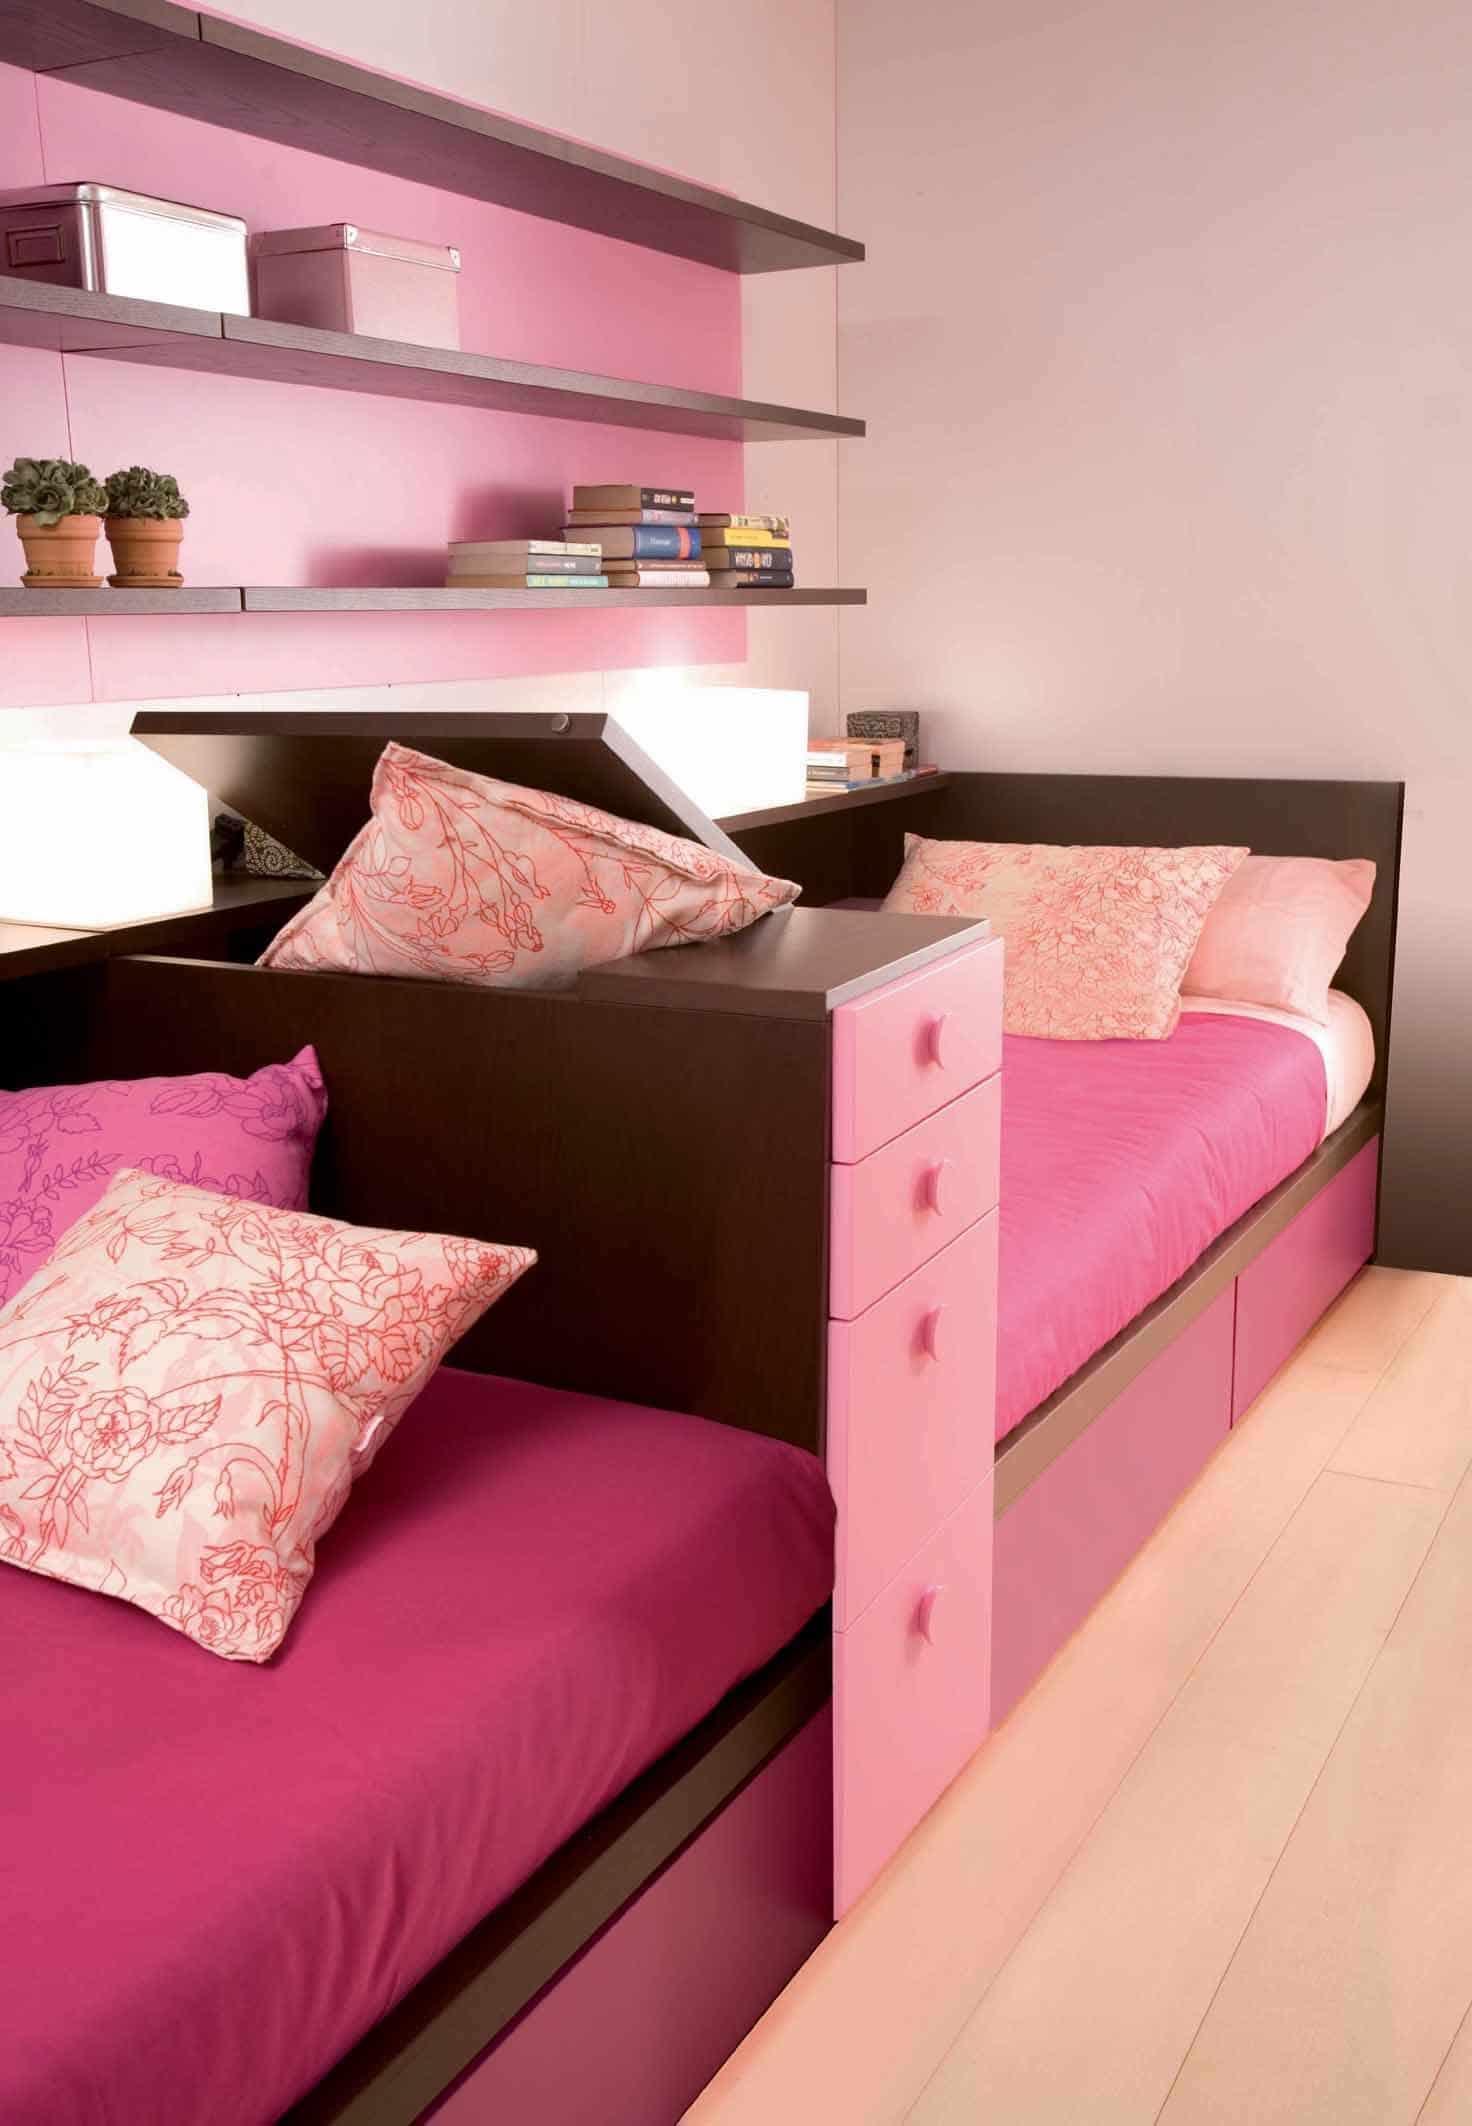 kinderbett mit stauraum mobimio. Black Bedroom Furniture Sets. Home Design Ideas